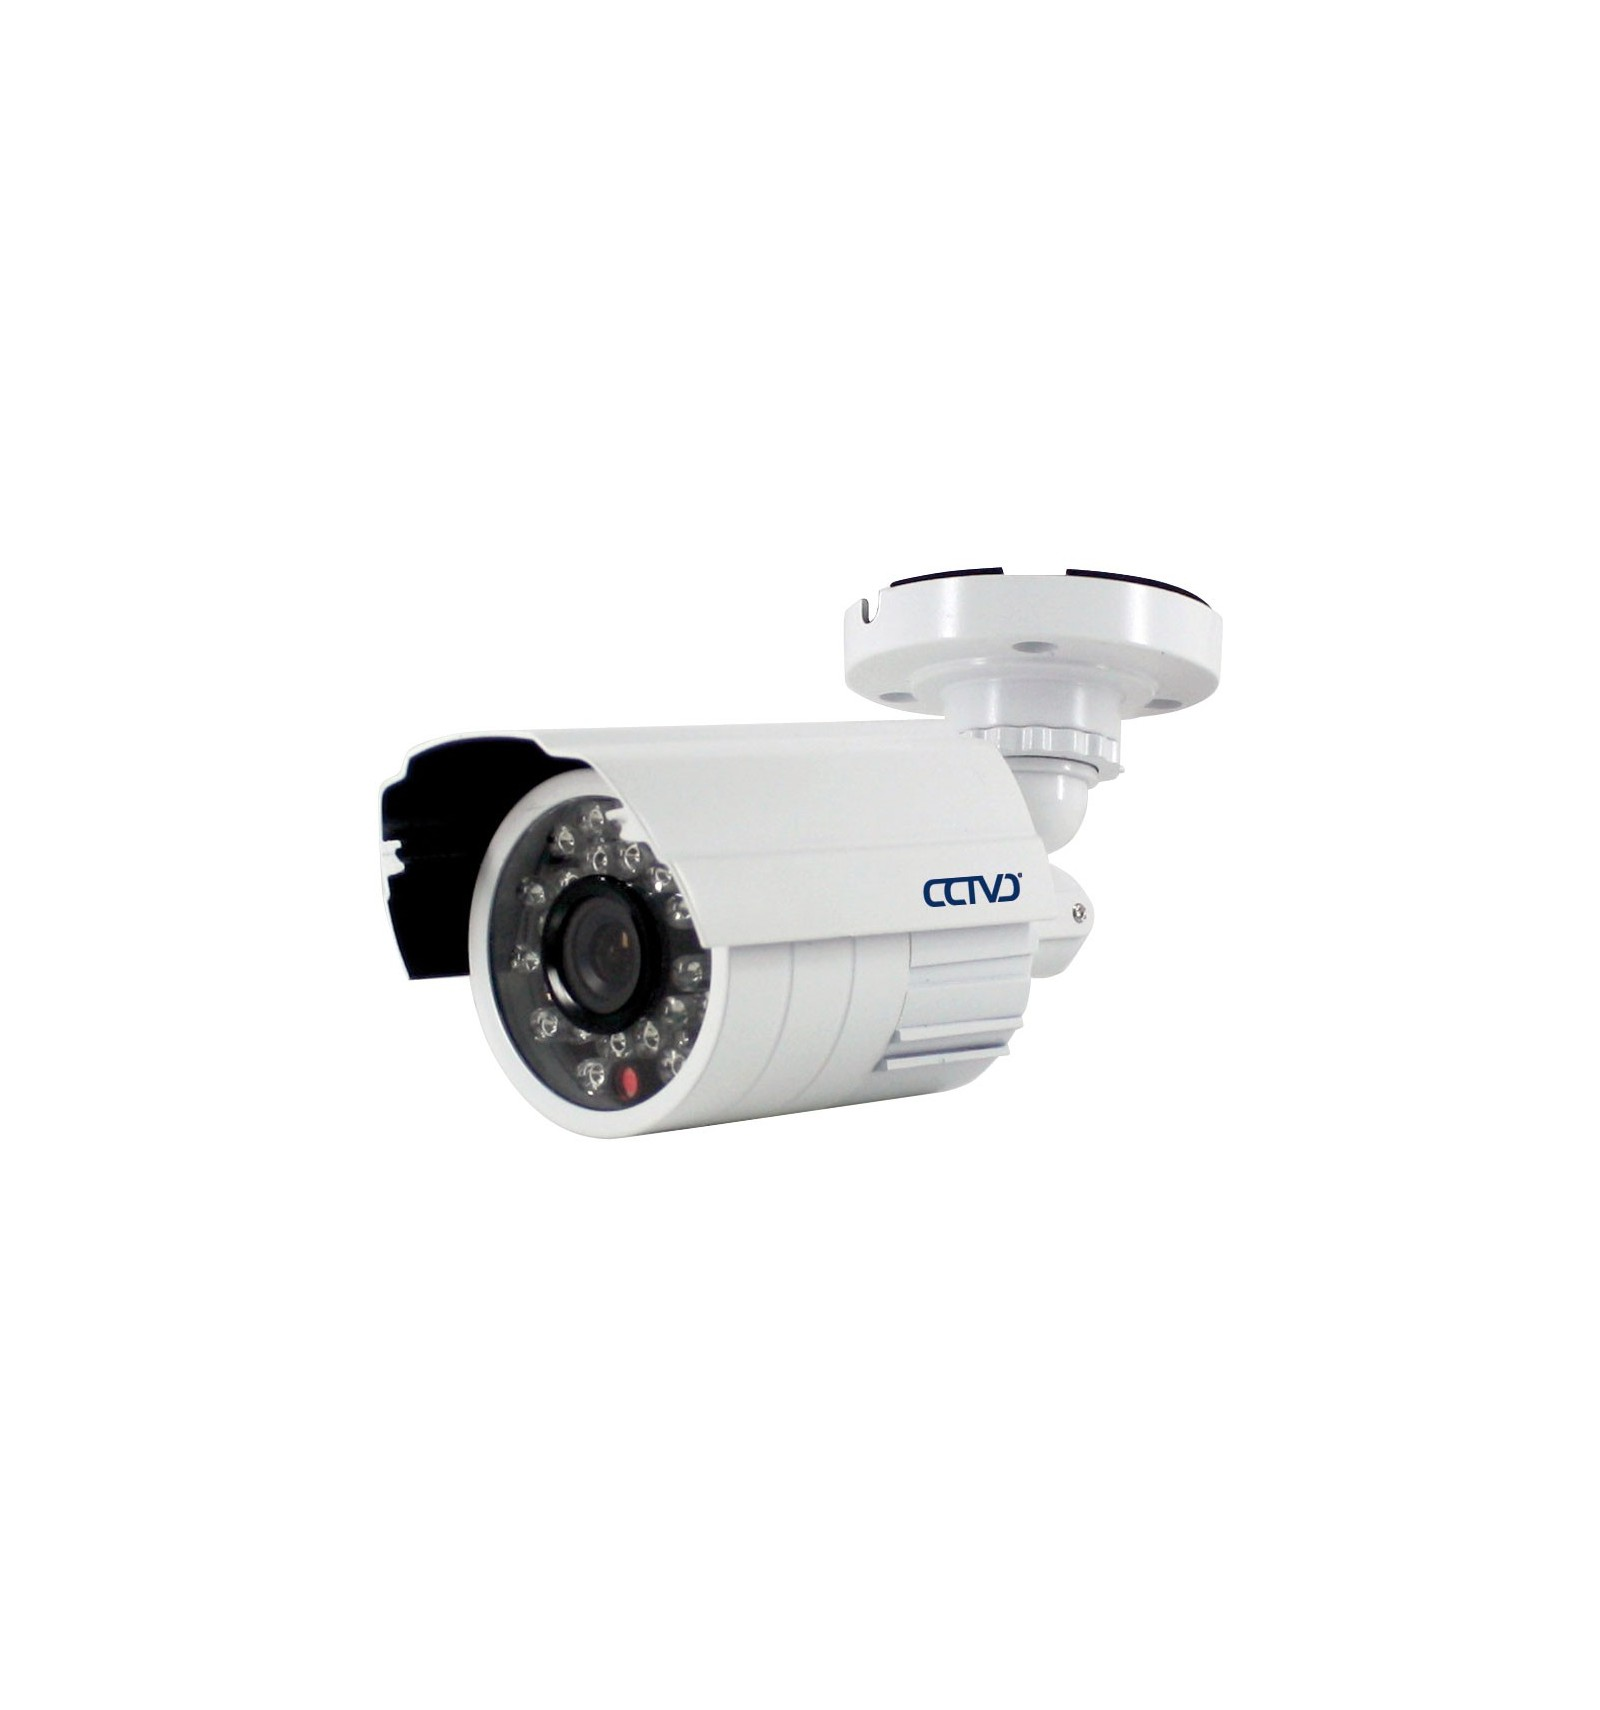 Camaras de vigilancia exterior gama economica for Camara vigilancia exterior